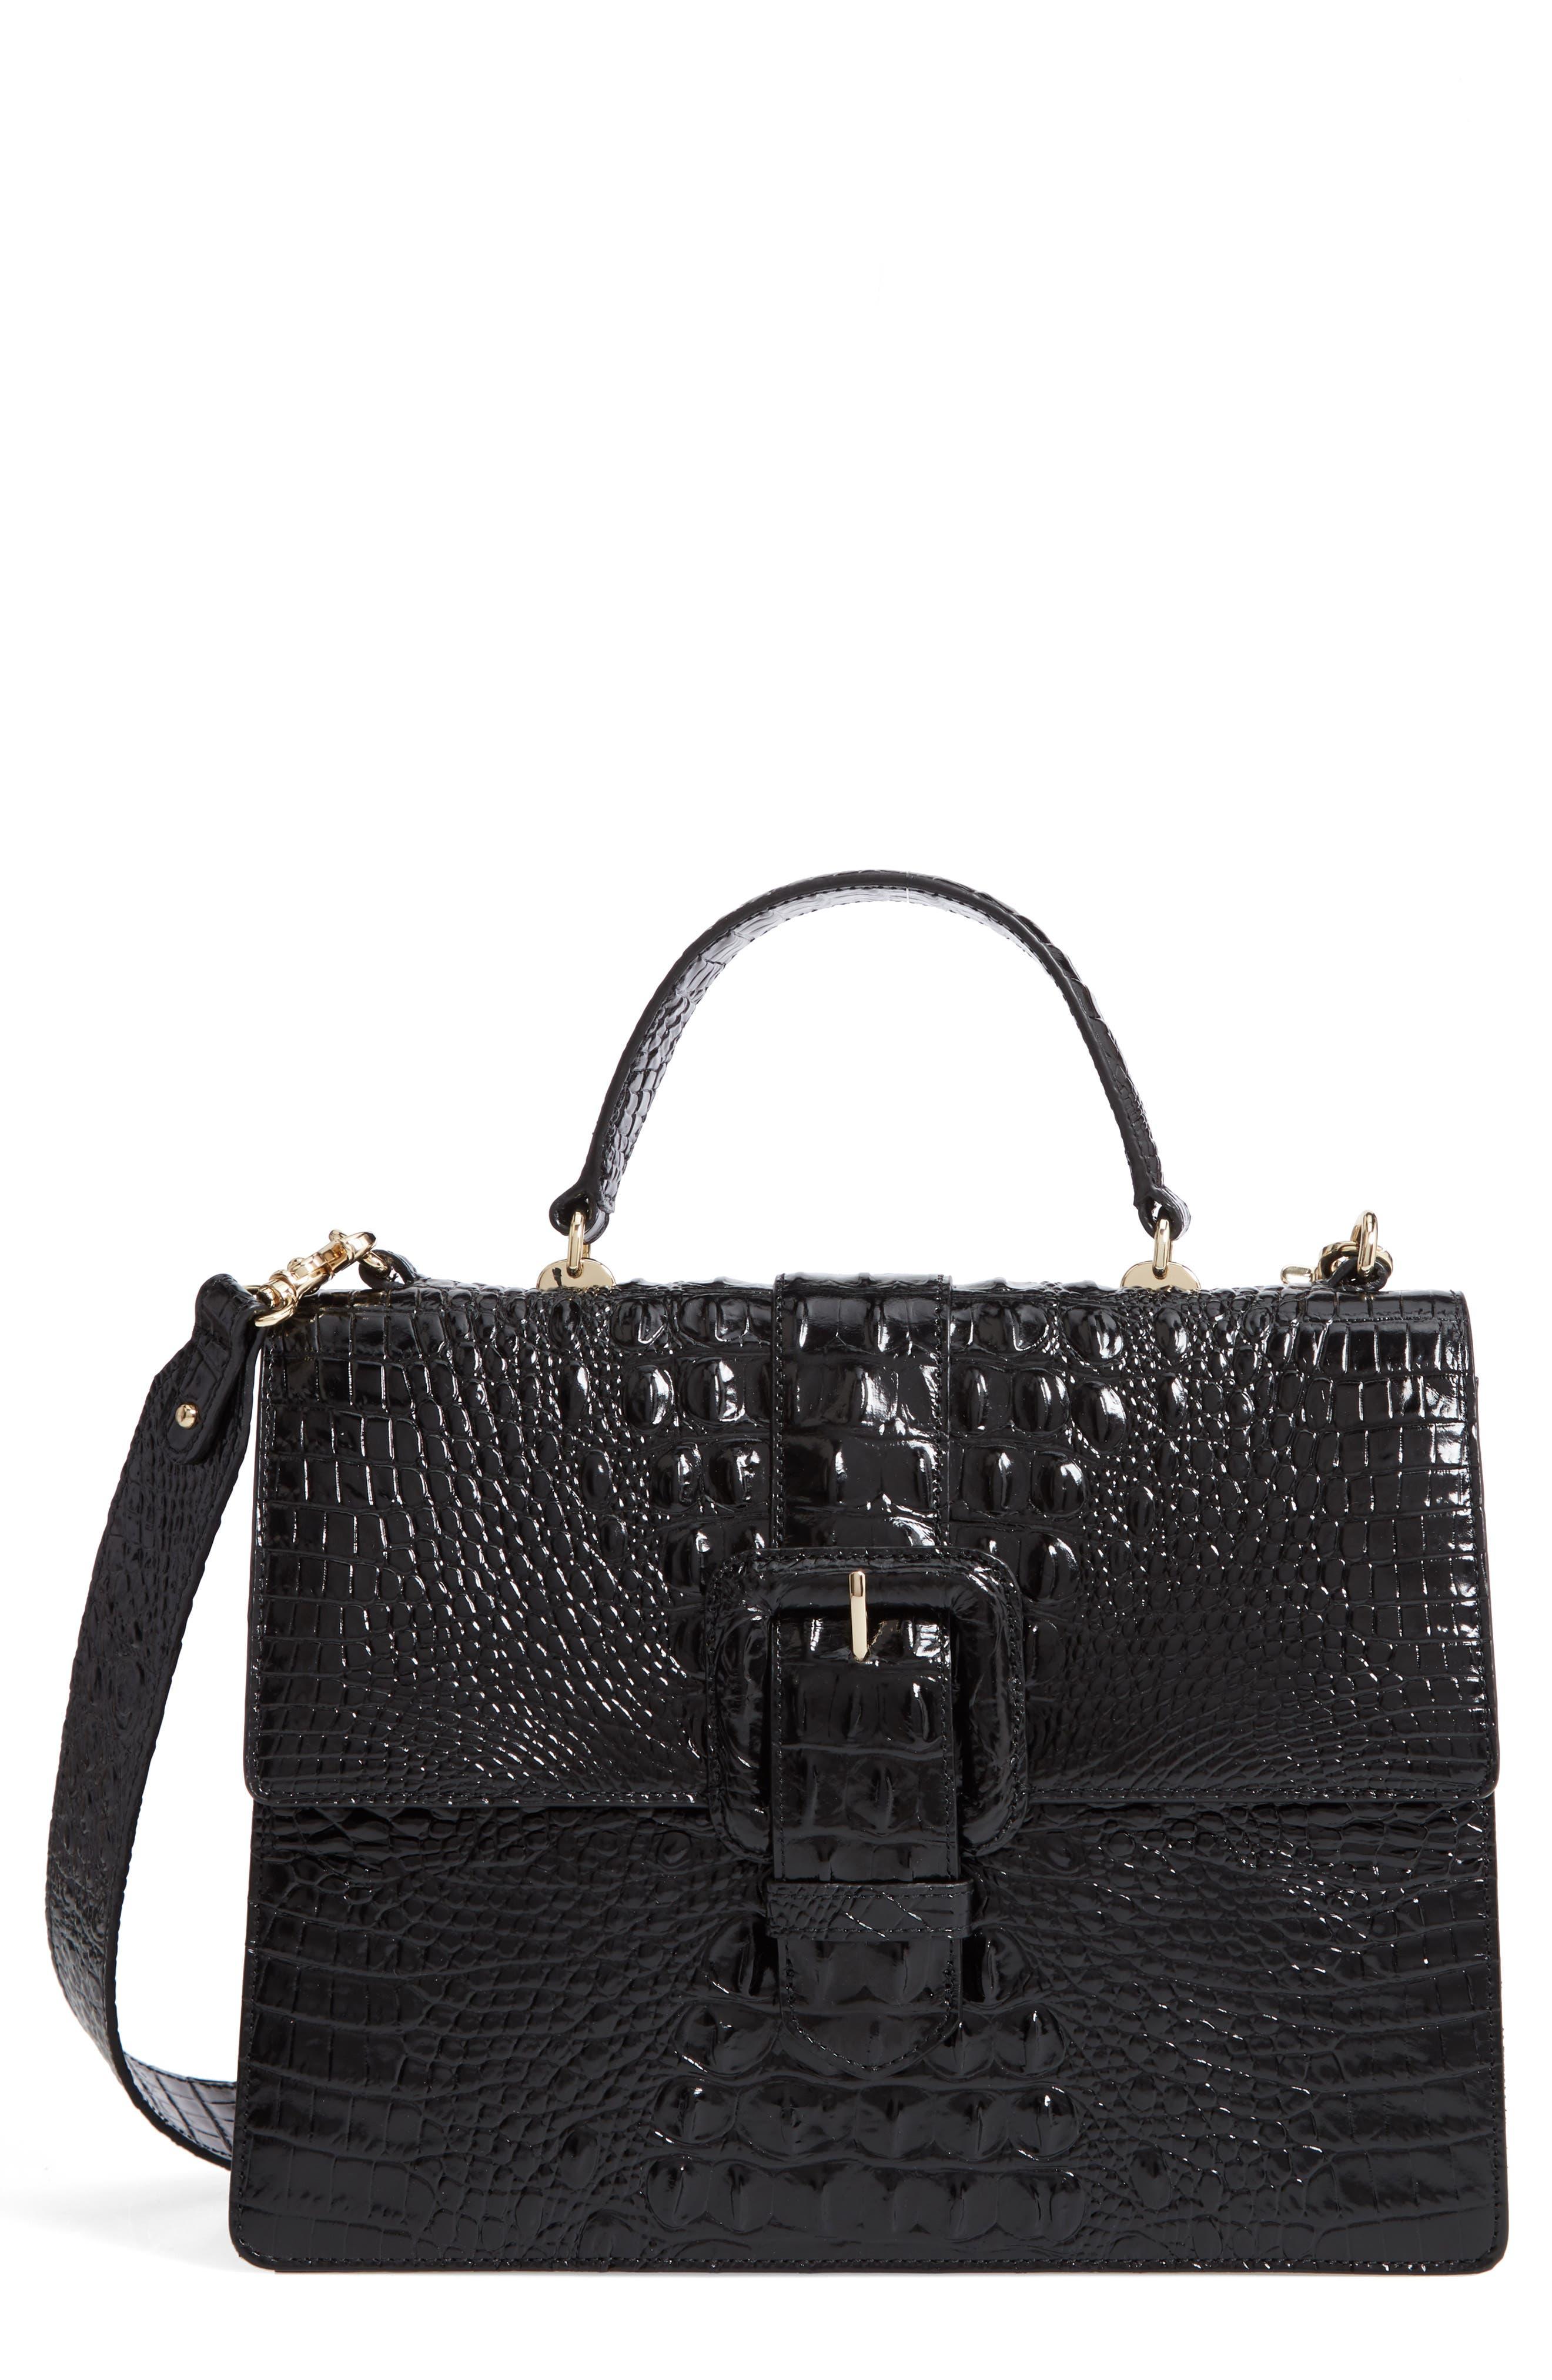 Medium Francine Croc Embossed Leather Satchel,                             Main thumbnail 1, color,                             BLACK